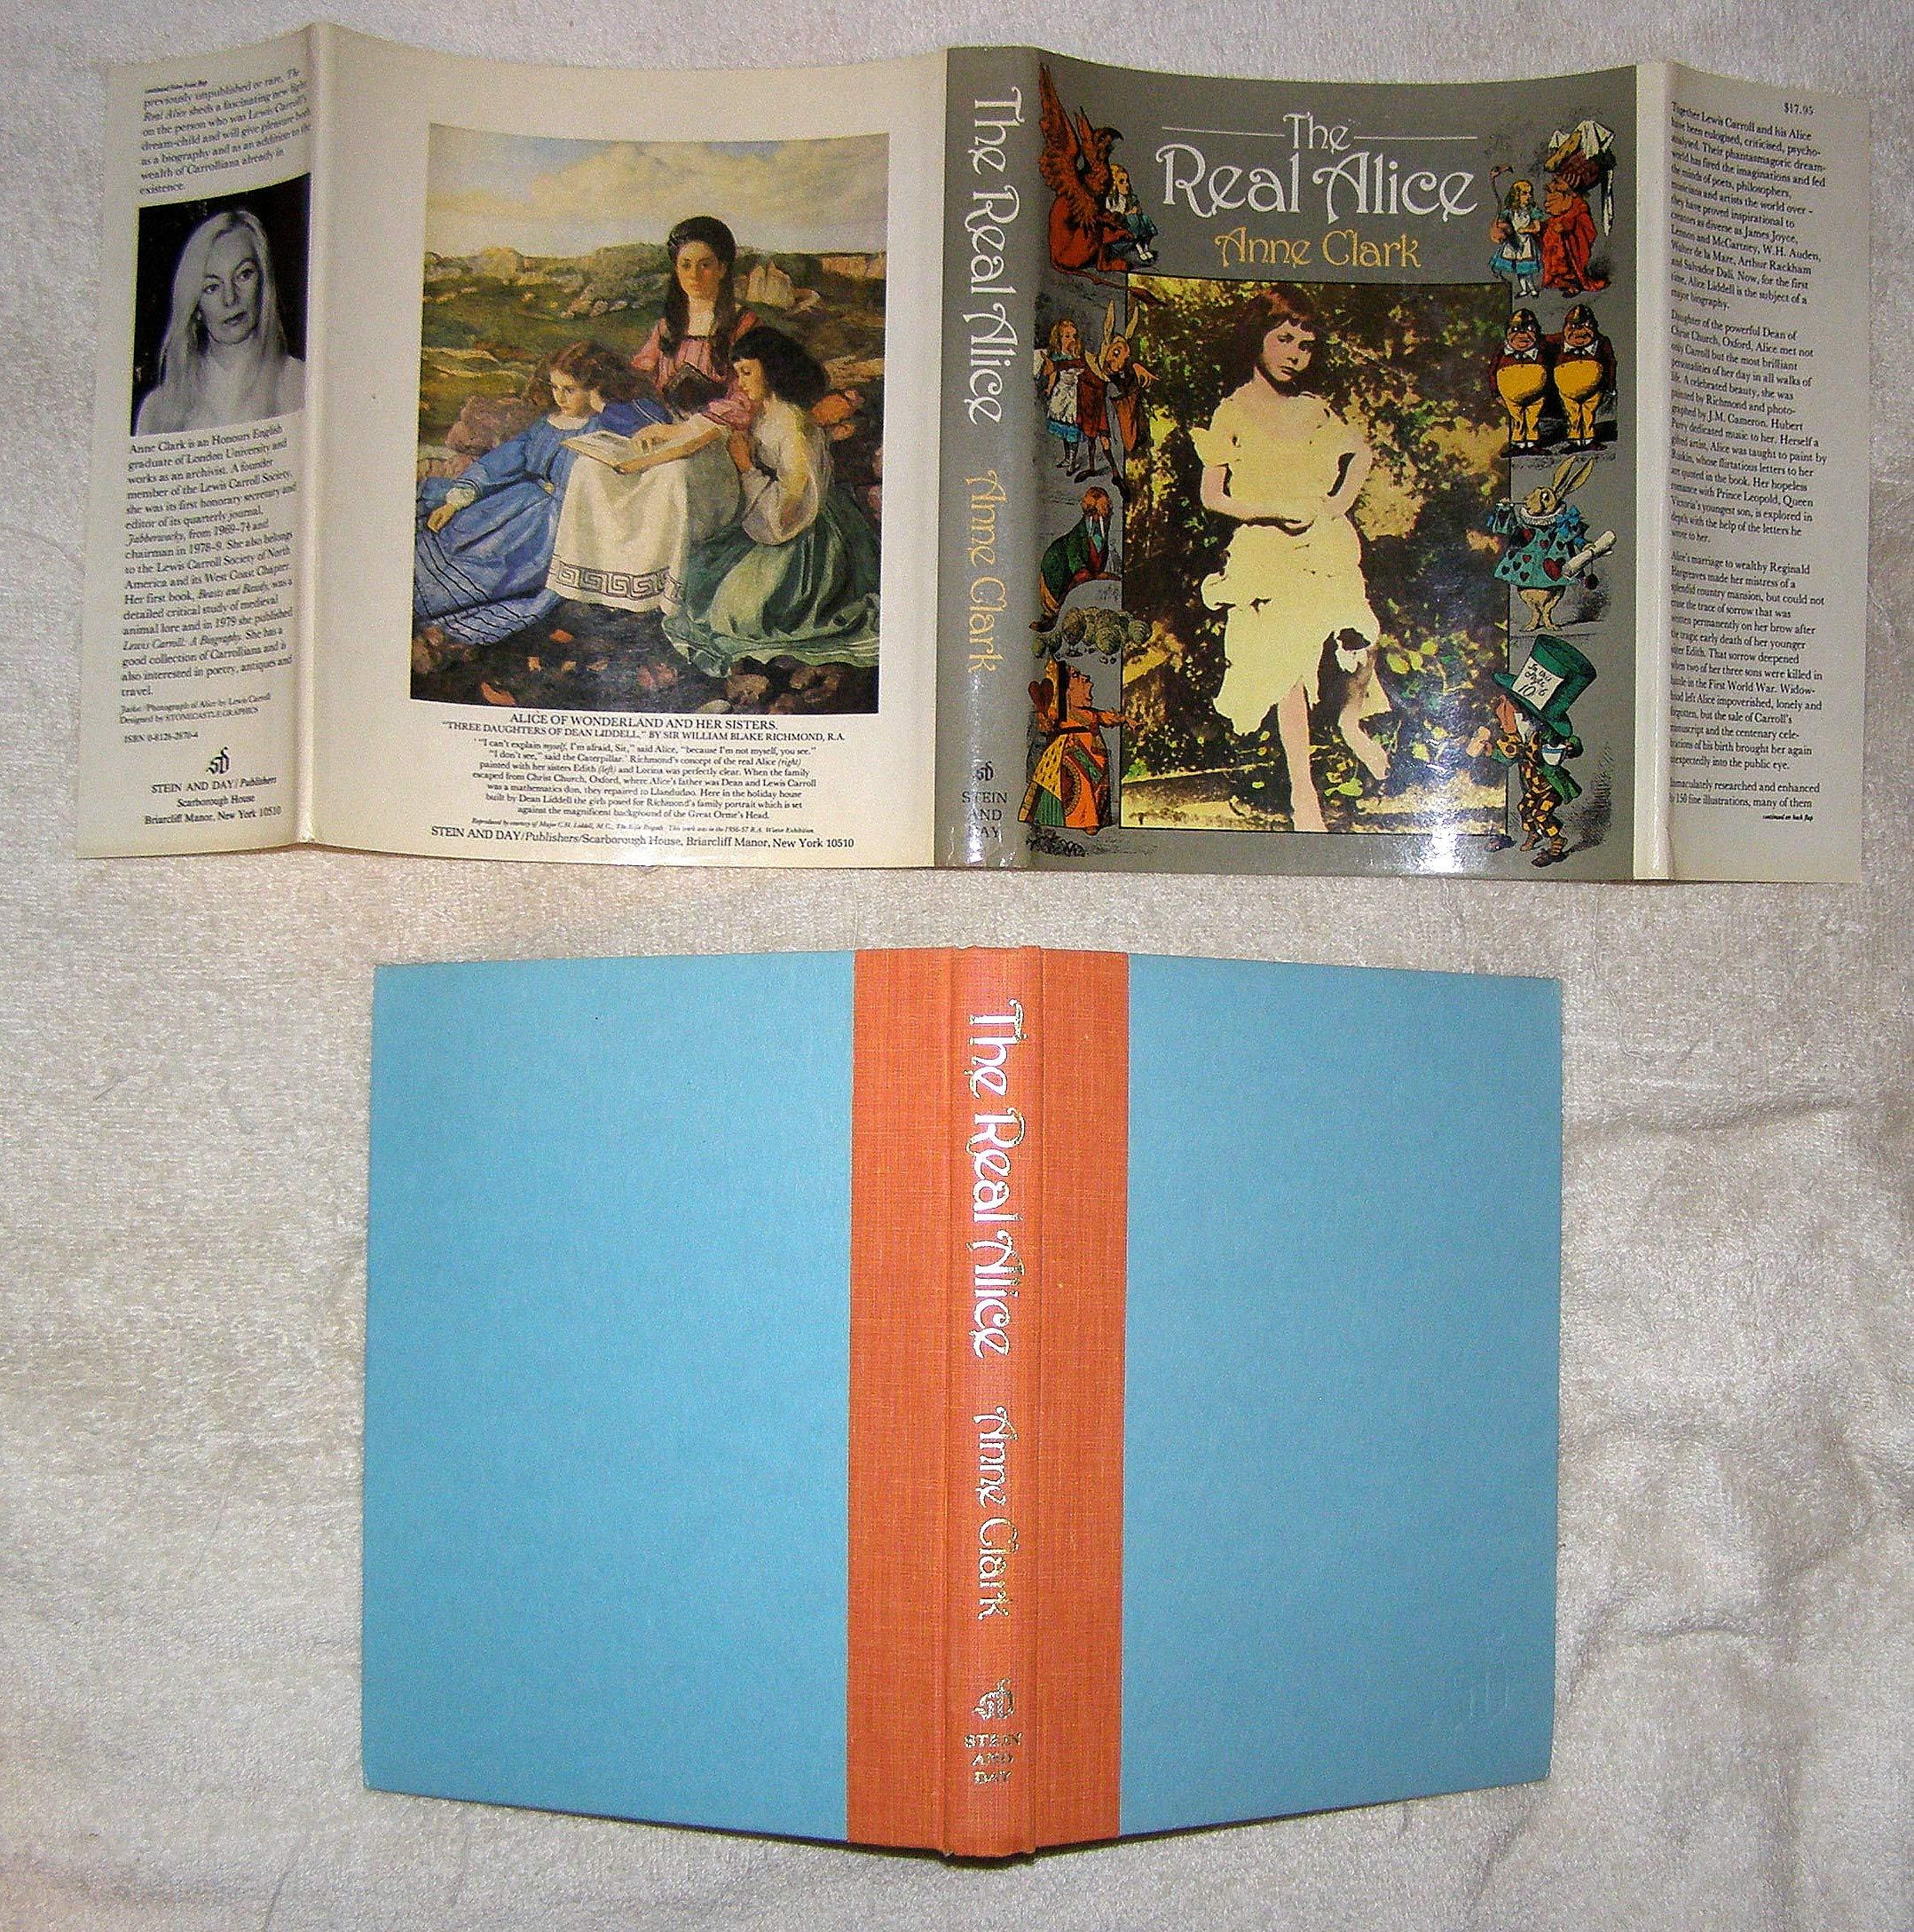 1893 ORIGINAL MUSIC BOOK PAGE WITH VINTAGE ARTWORK OF ALICE IN WONDERLAND